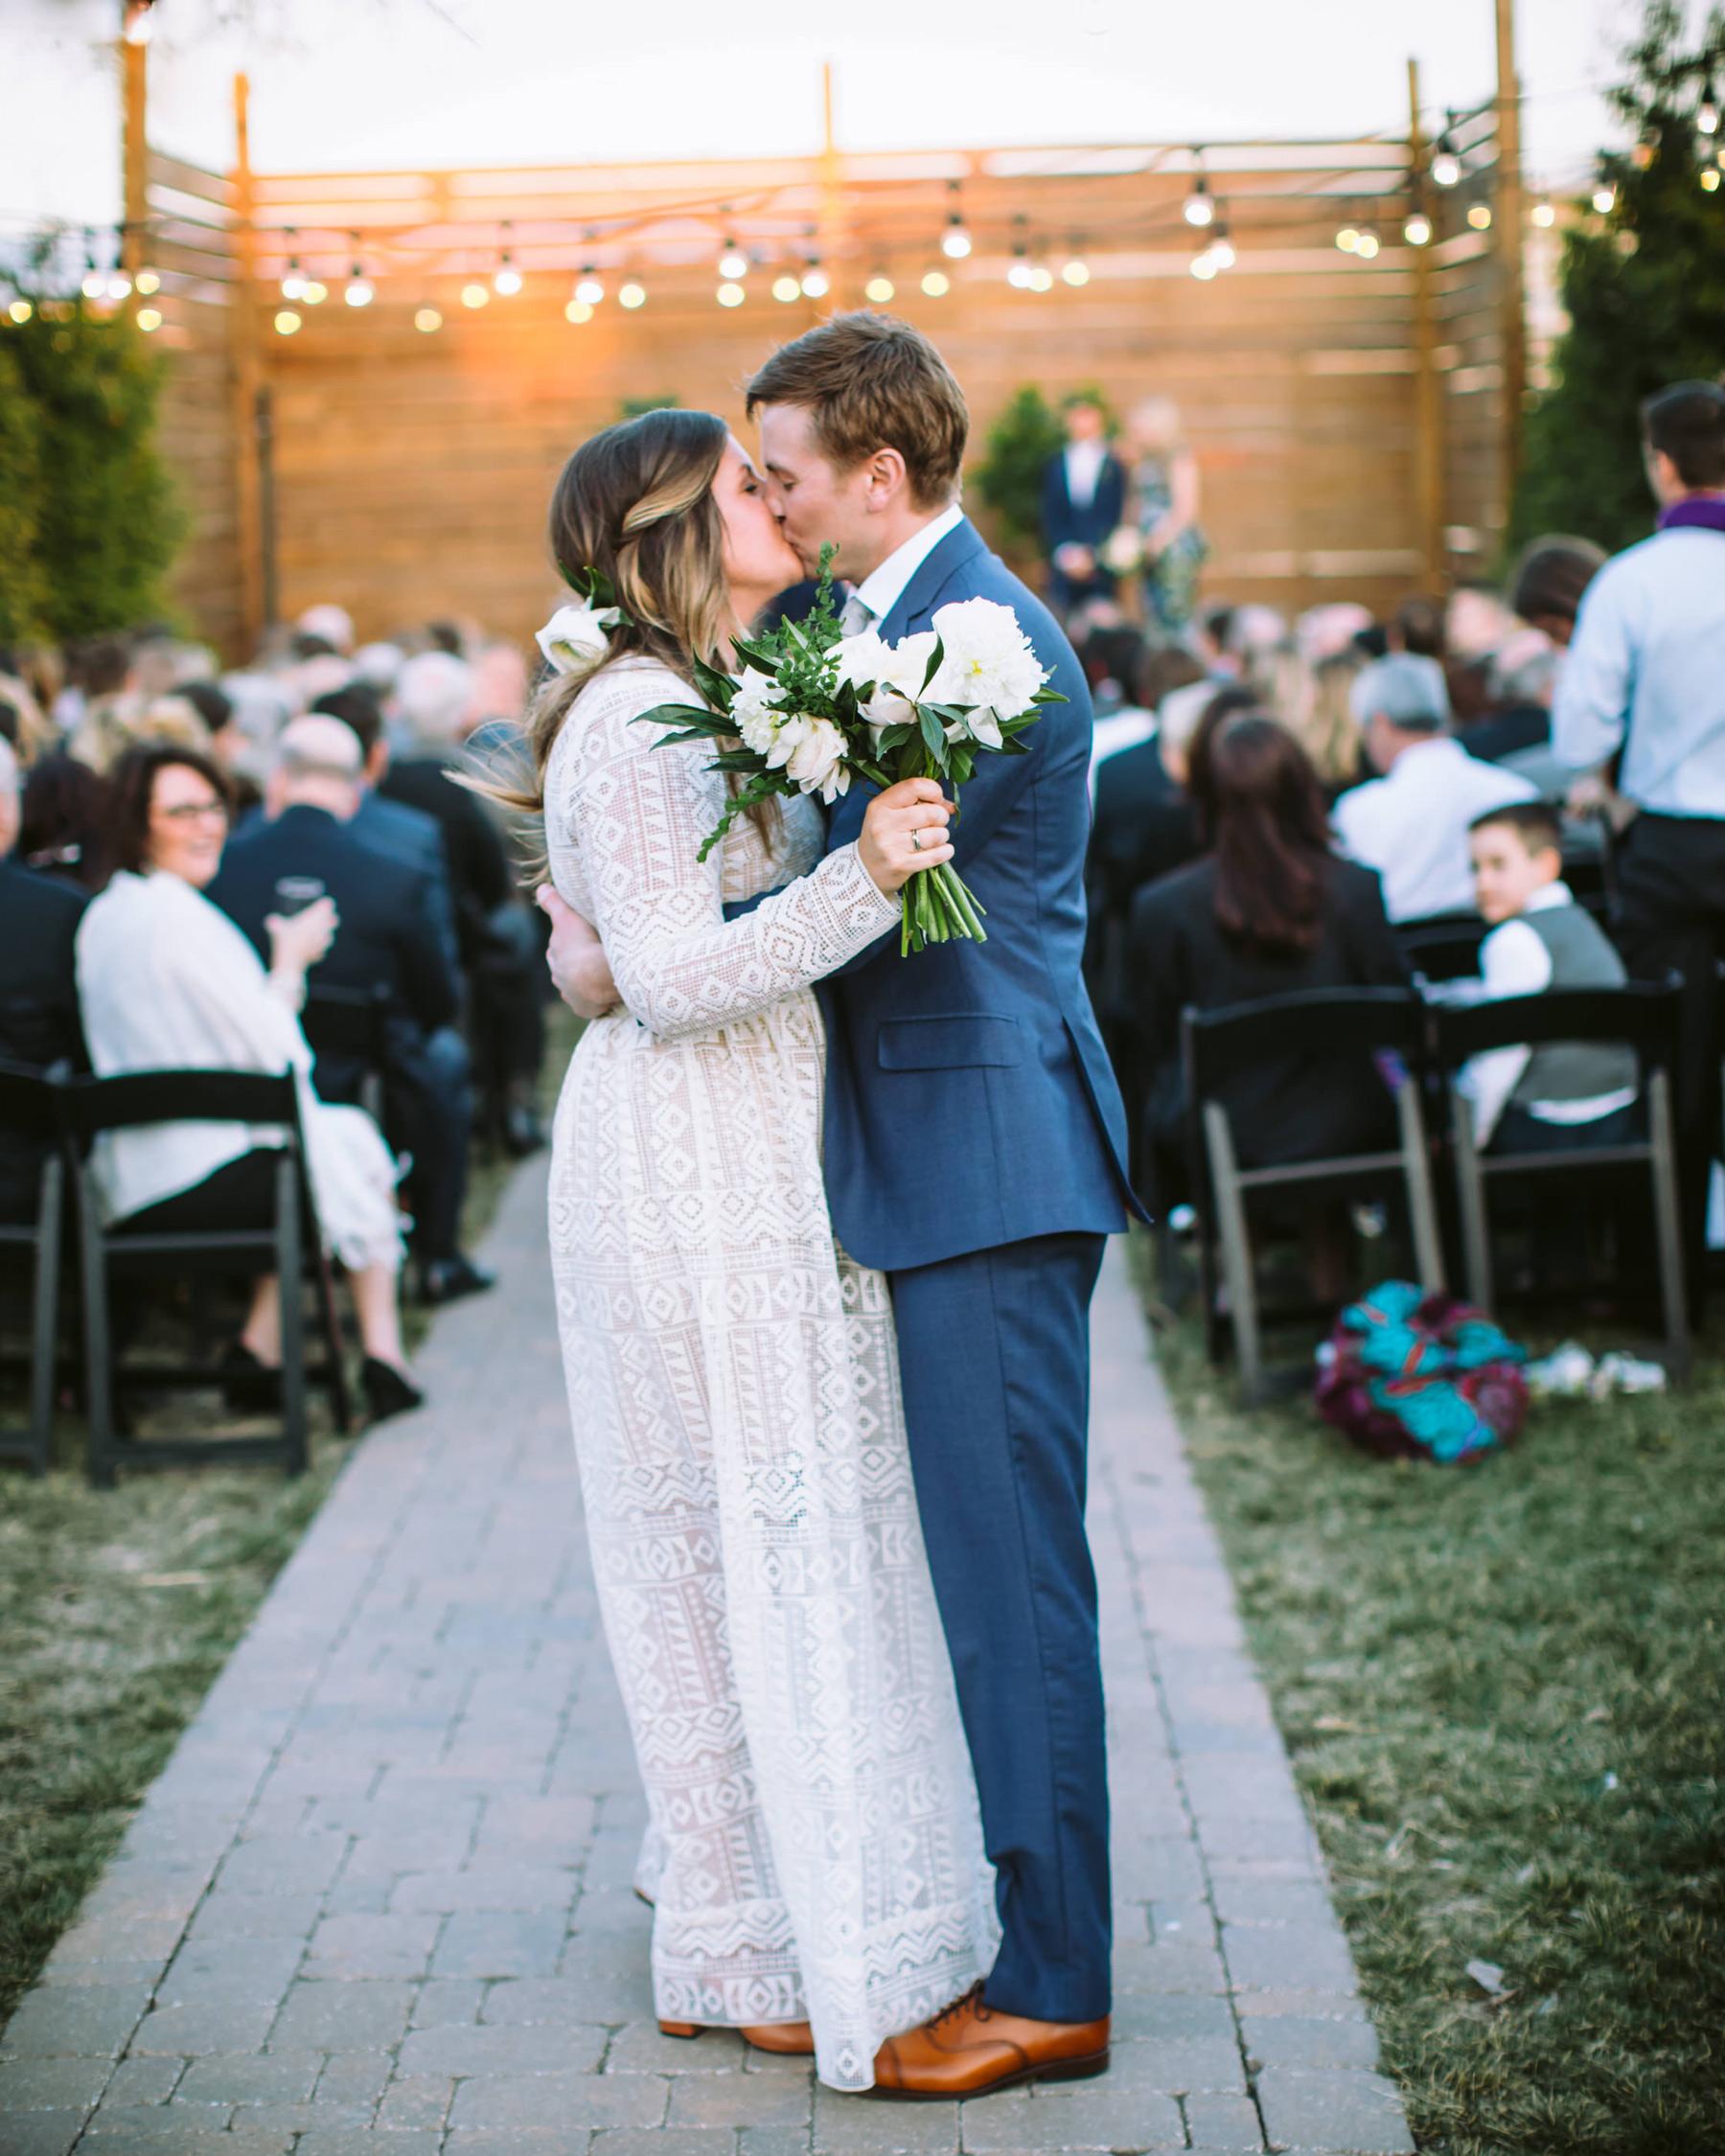 Pete + Susannah The Guild Kansas City Bohemian Outdoor Wedding _Kindling Wedding Photography - 51.JPG